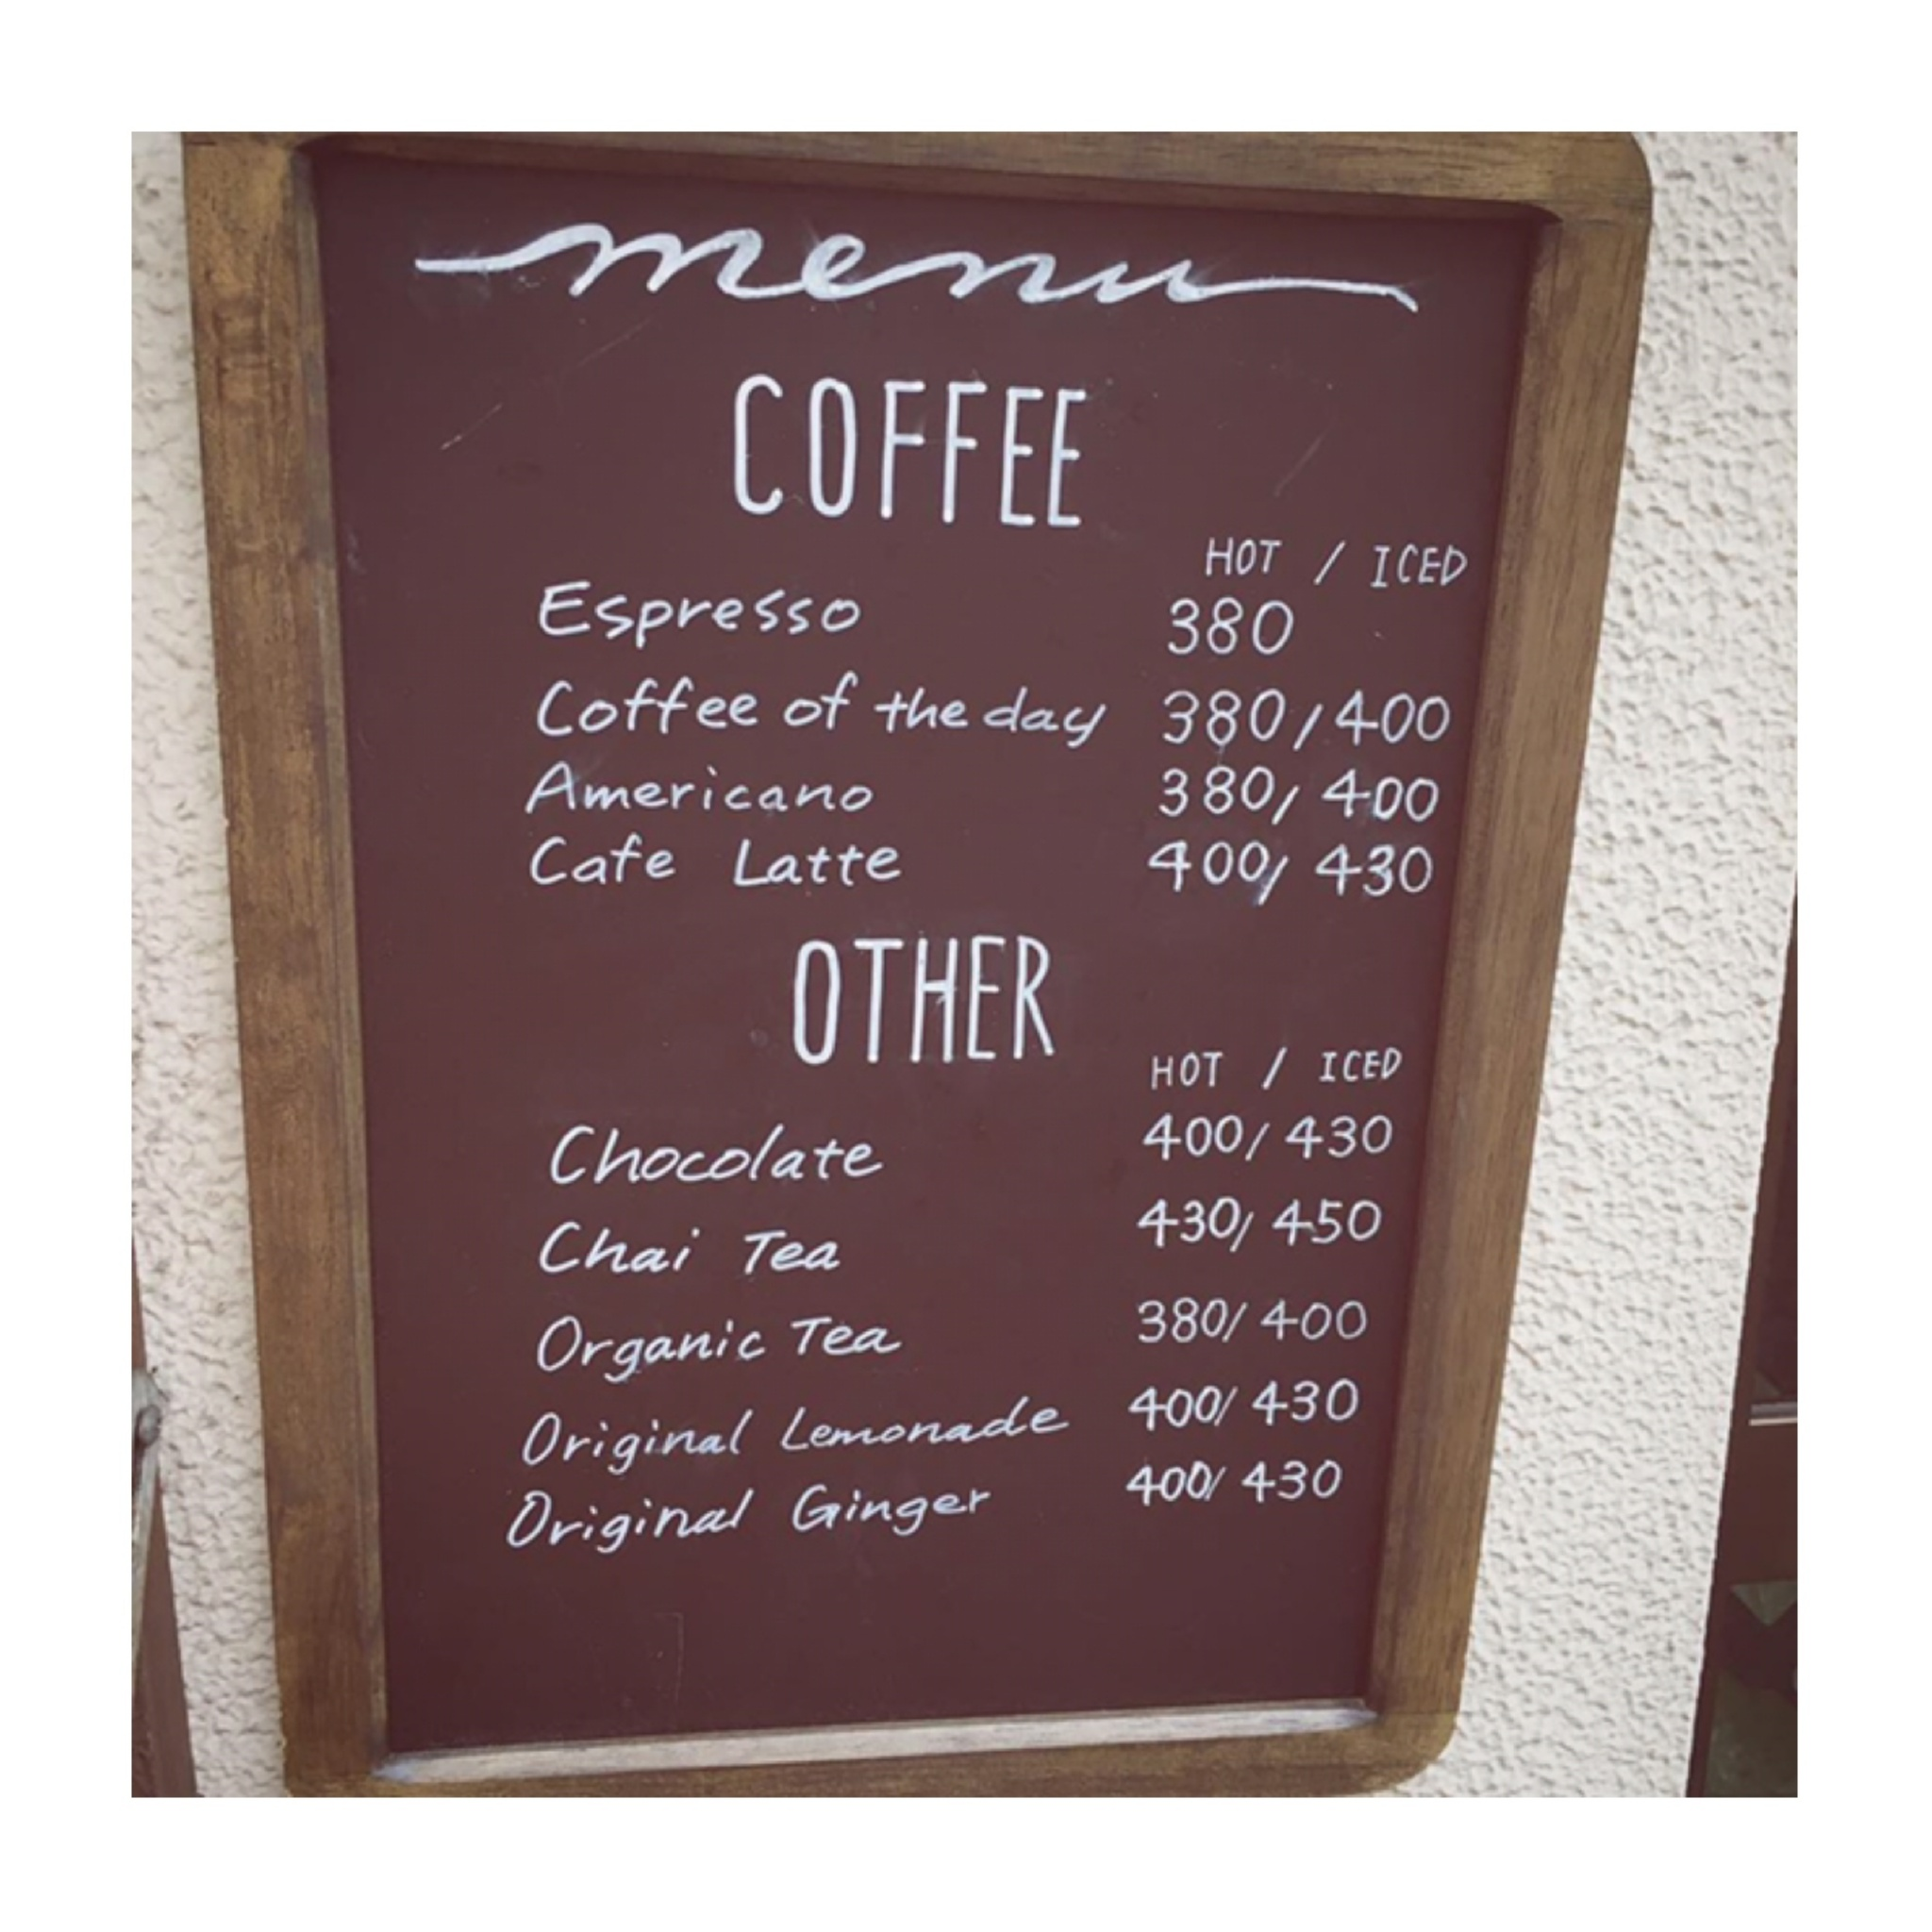 #15【#cafestagram】❤️:《東京•蔵前》身体にやさしいコーヒーを飲みに『SOL'S COFFEE』へ☻_2